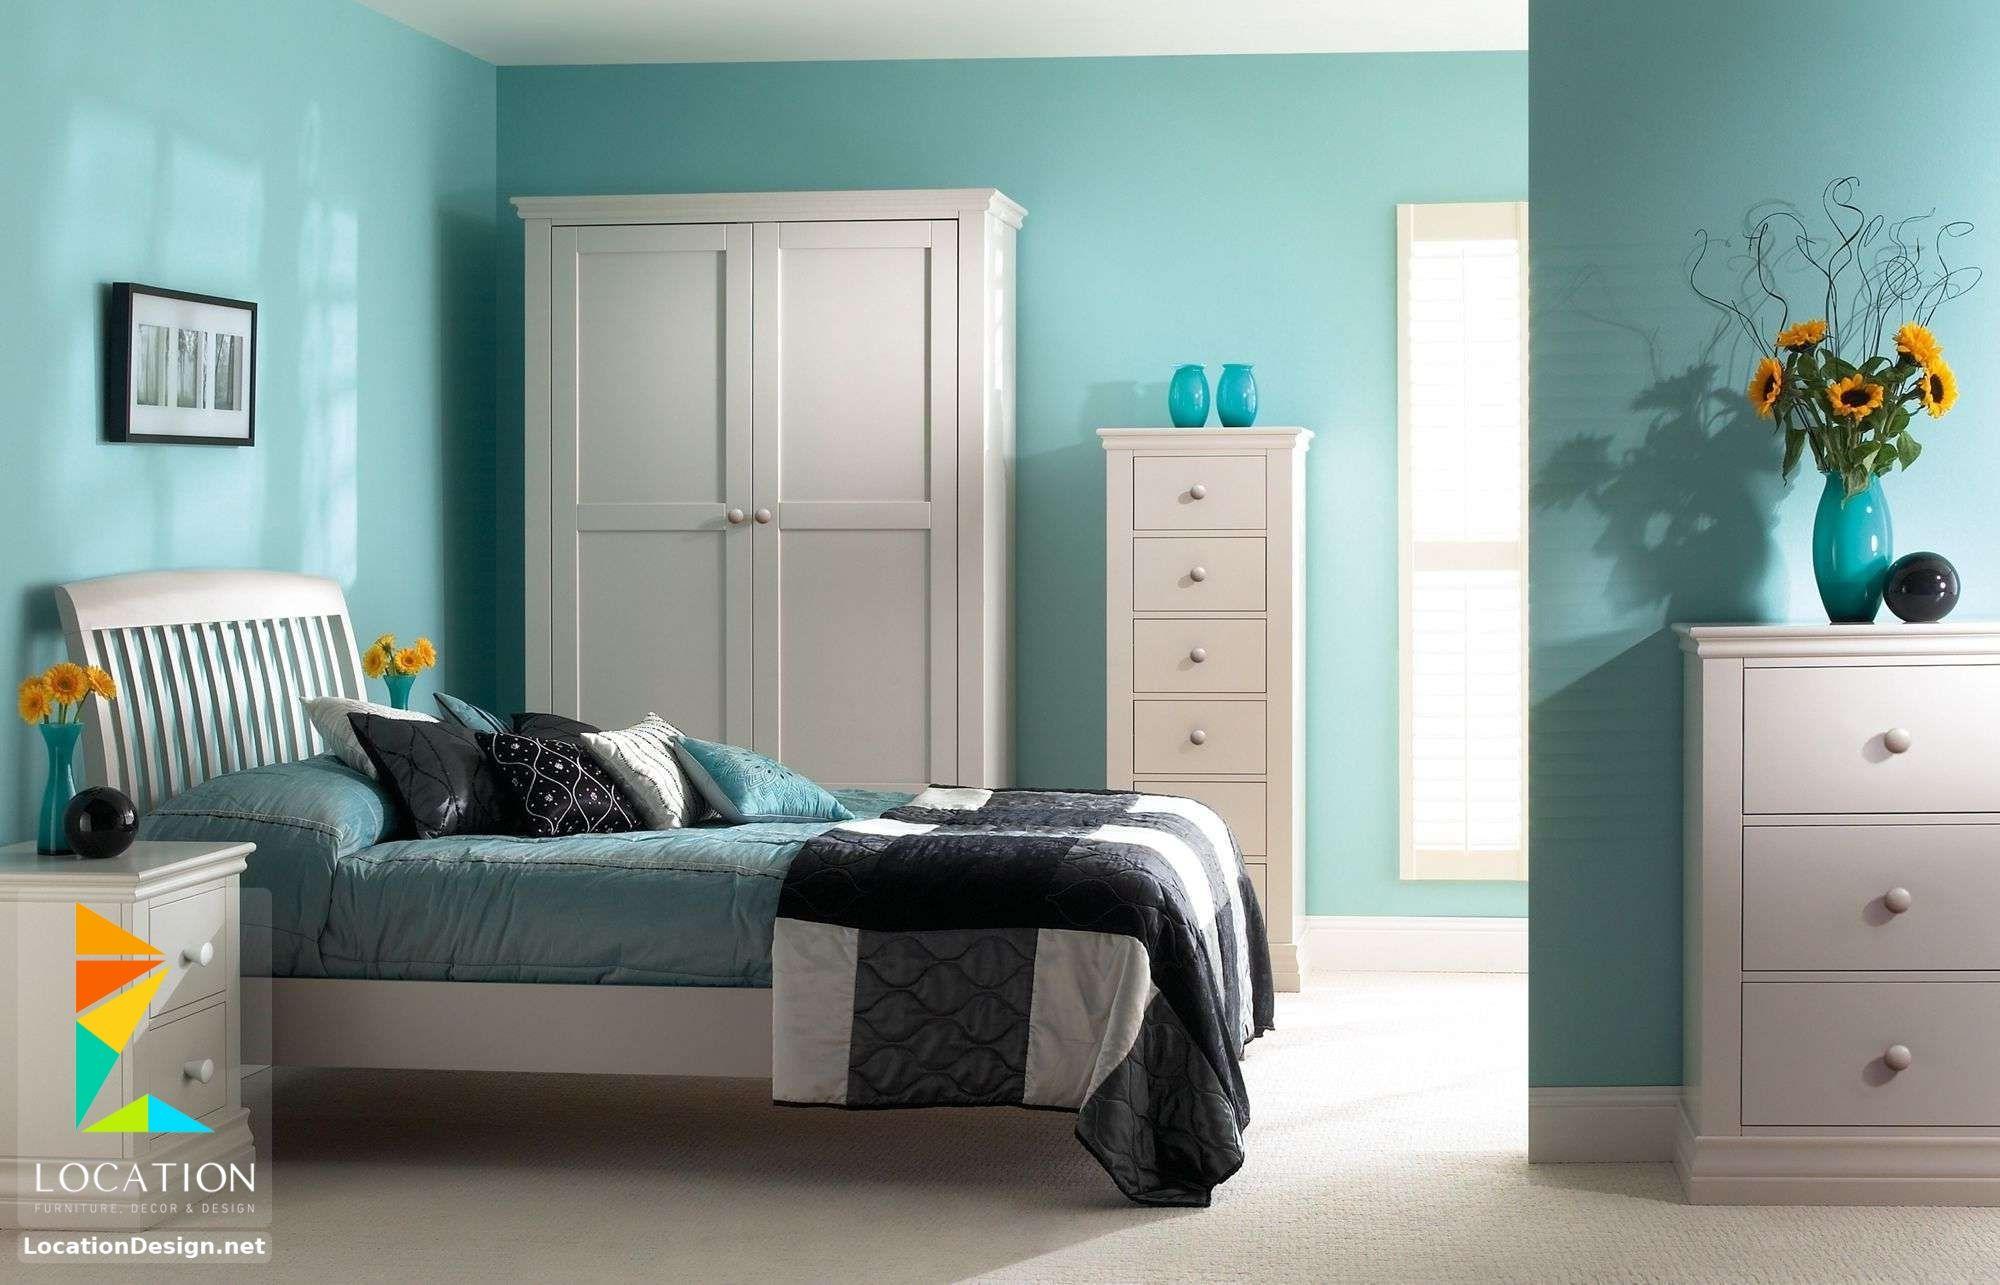 ديكورات غرف نوم صغيرة وبسيطة لوكشين ديزين نت Turquoise Room Girls Blue Bedroom Turquoise Bedroom Decor